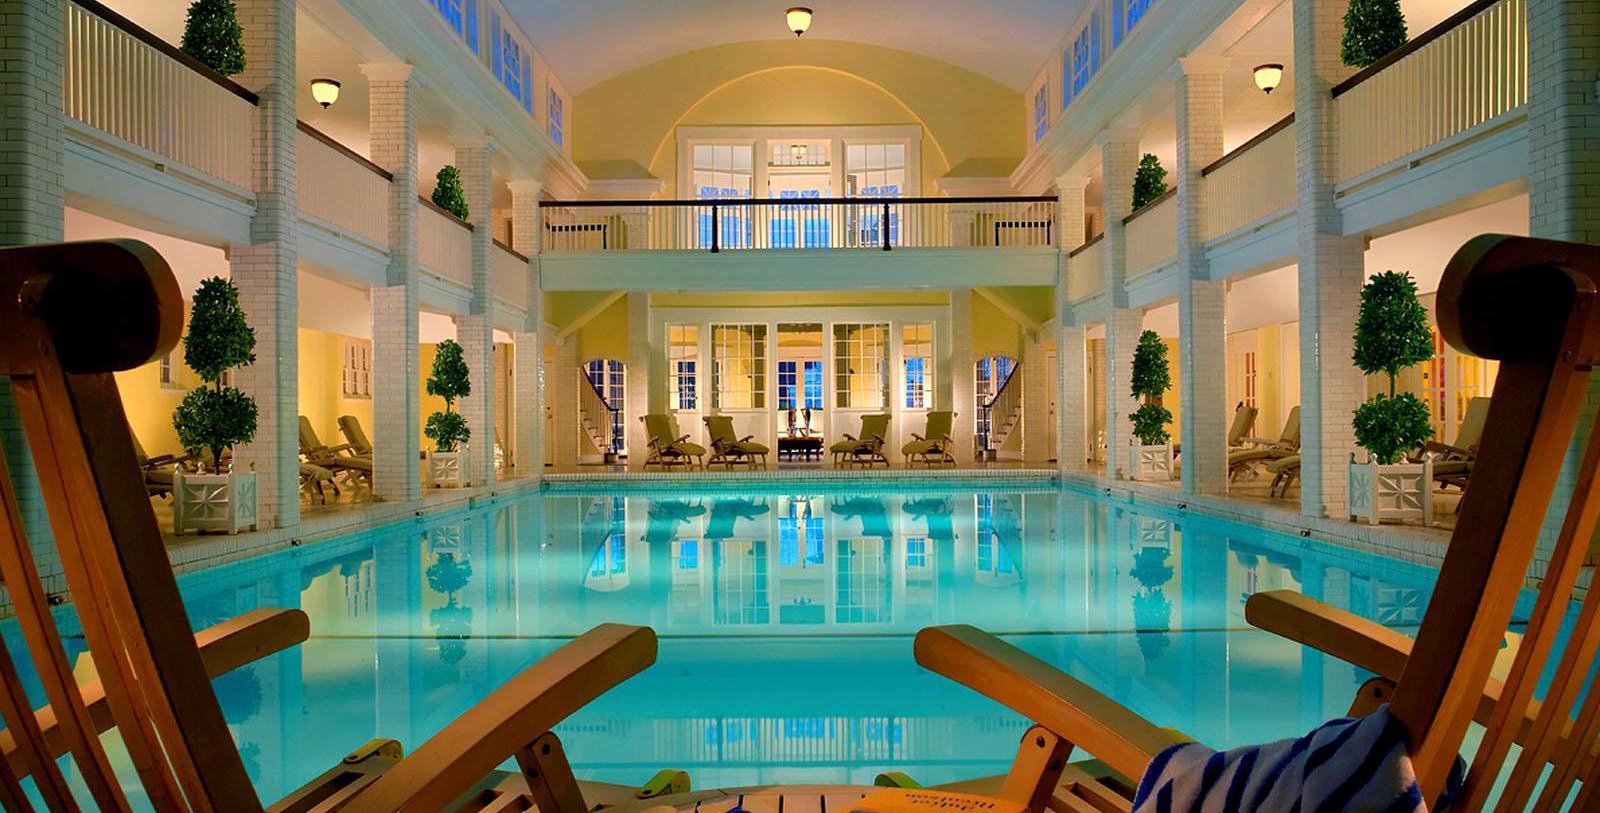 Image of Indoor Pool, Omni Bedford Springs Resort & Spa, Bedford, Pennsylvania, 1806, Member of Historic Hotels of America, Hot Deals